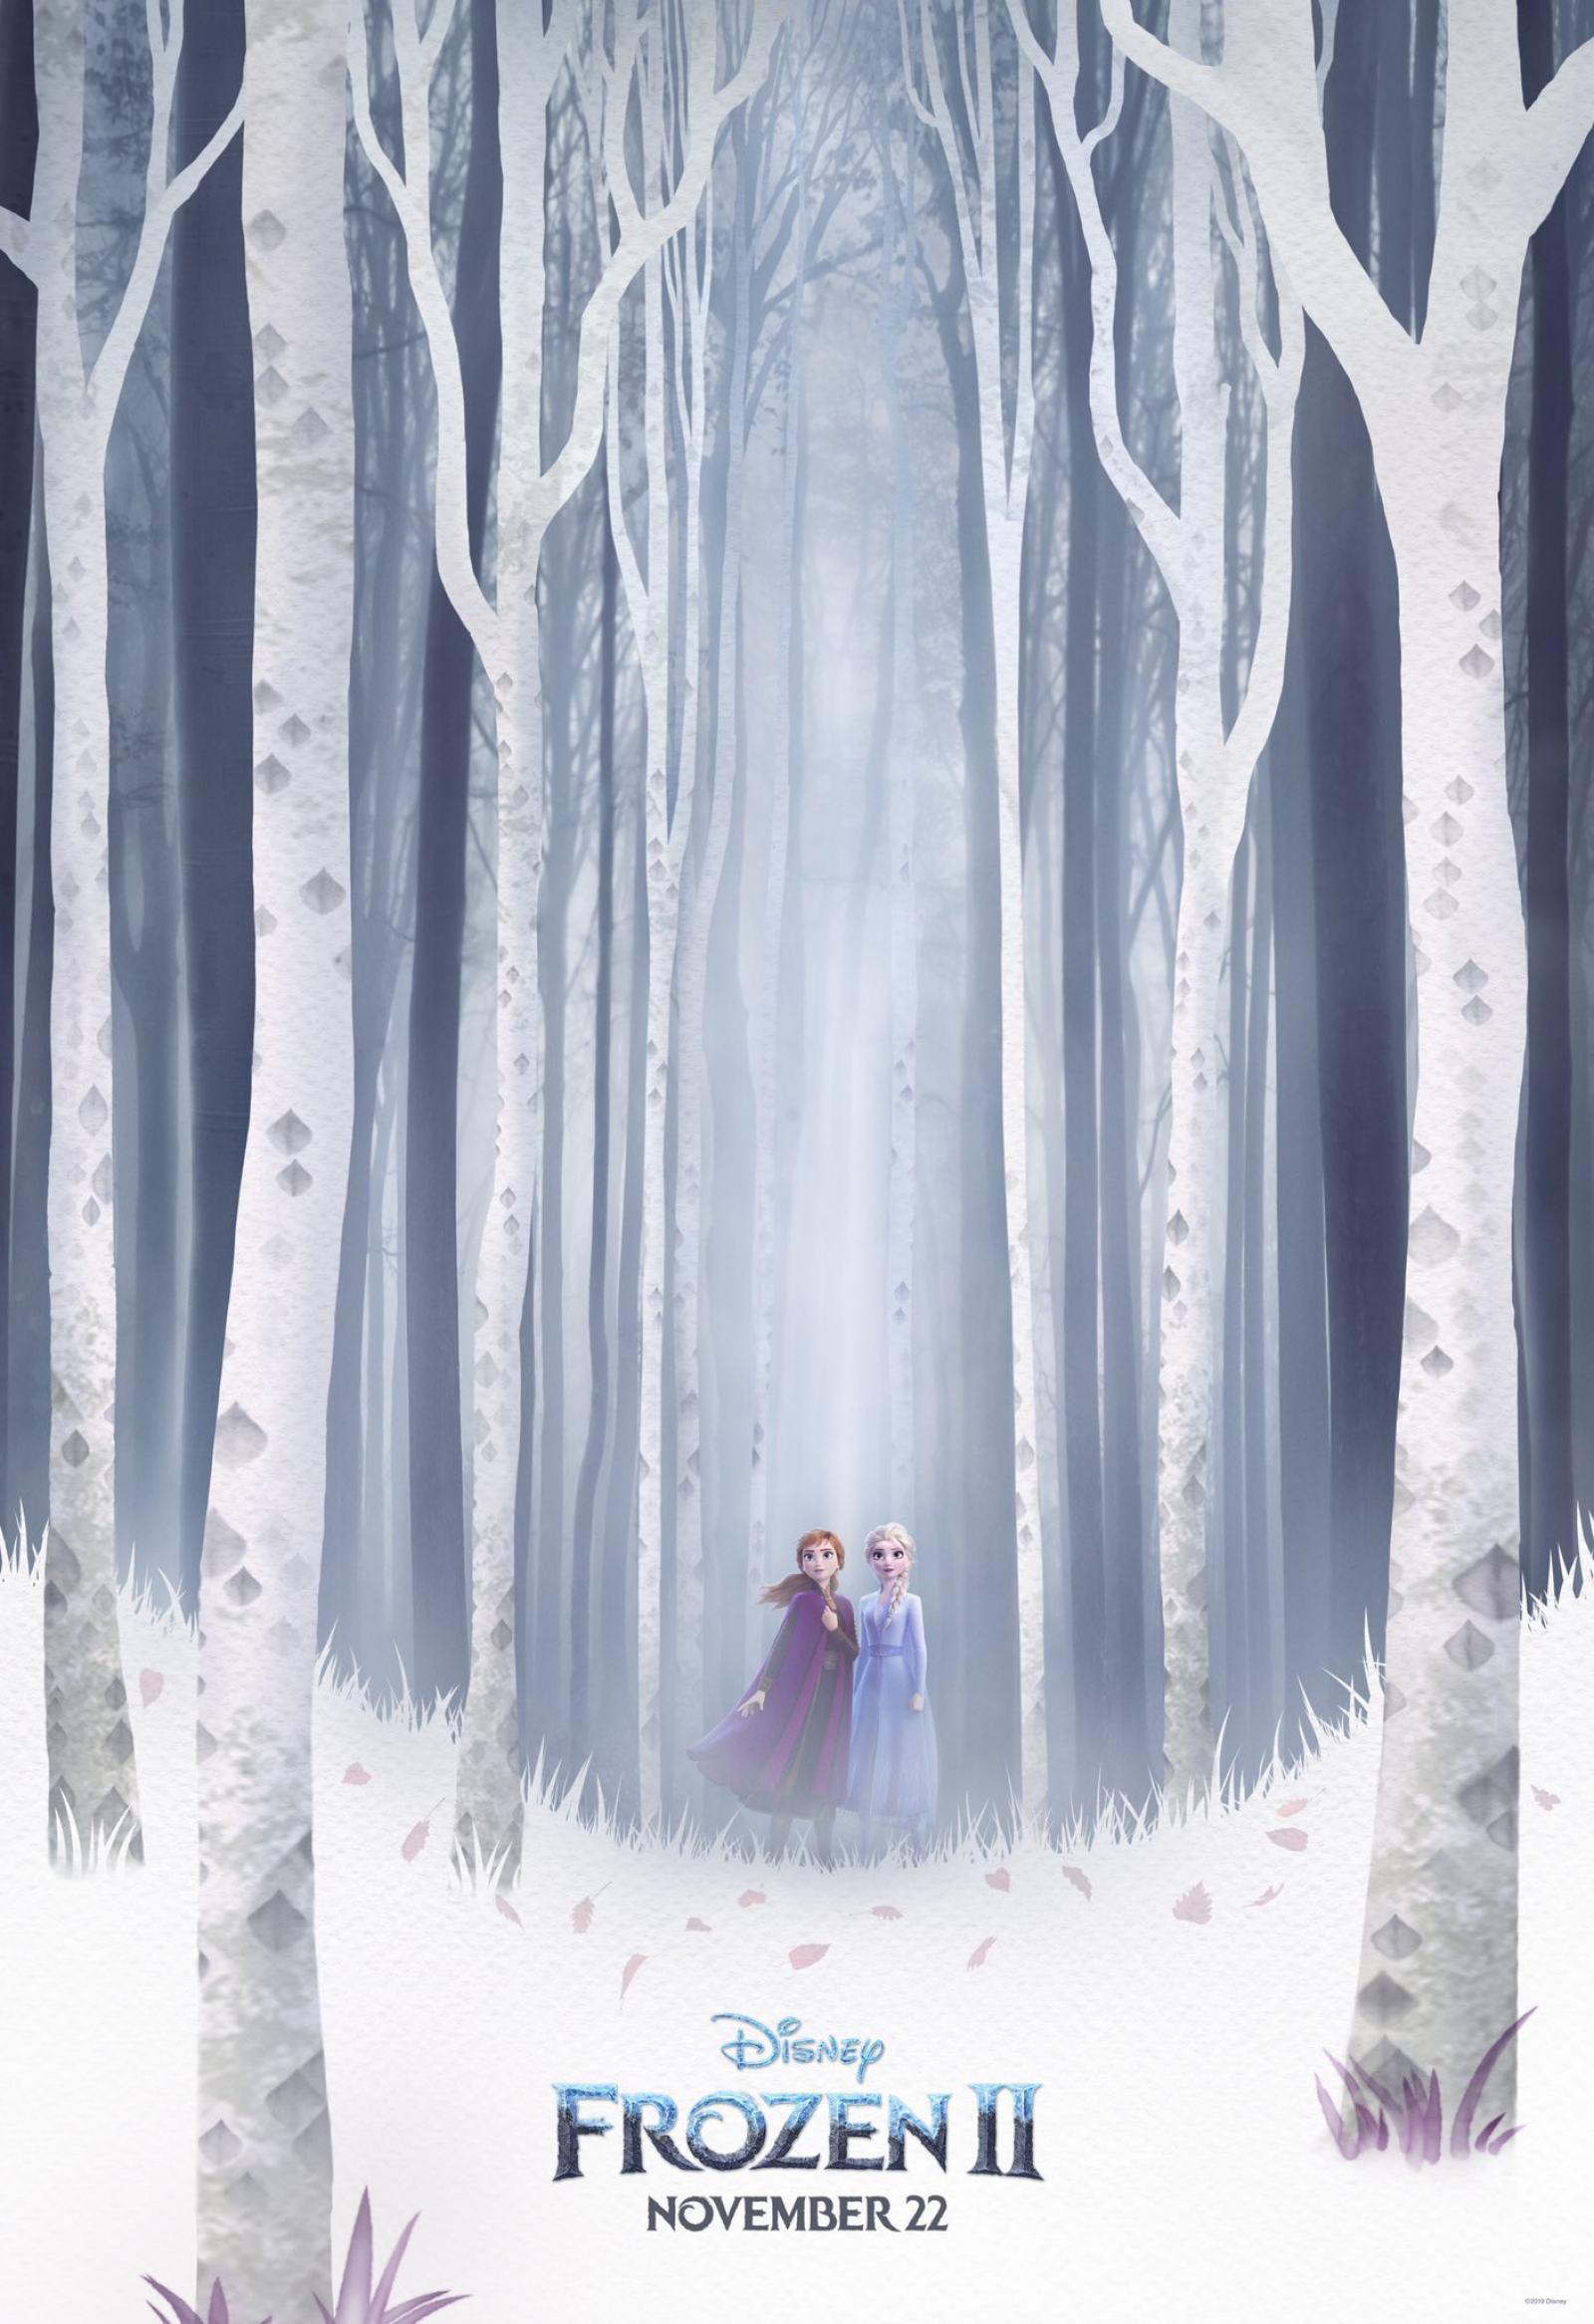 Frozen 2 Poster #3